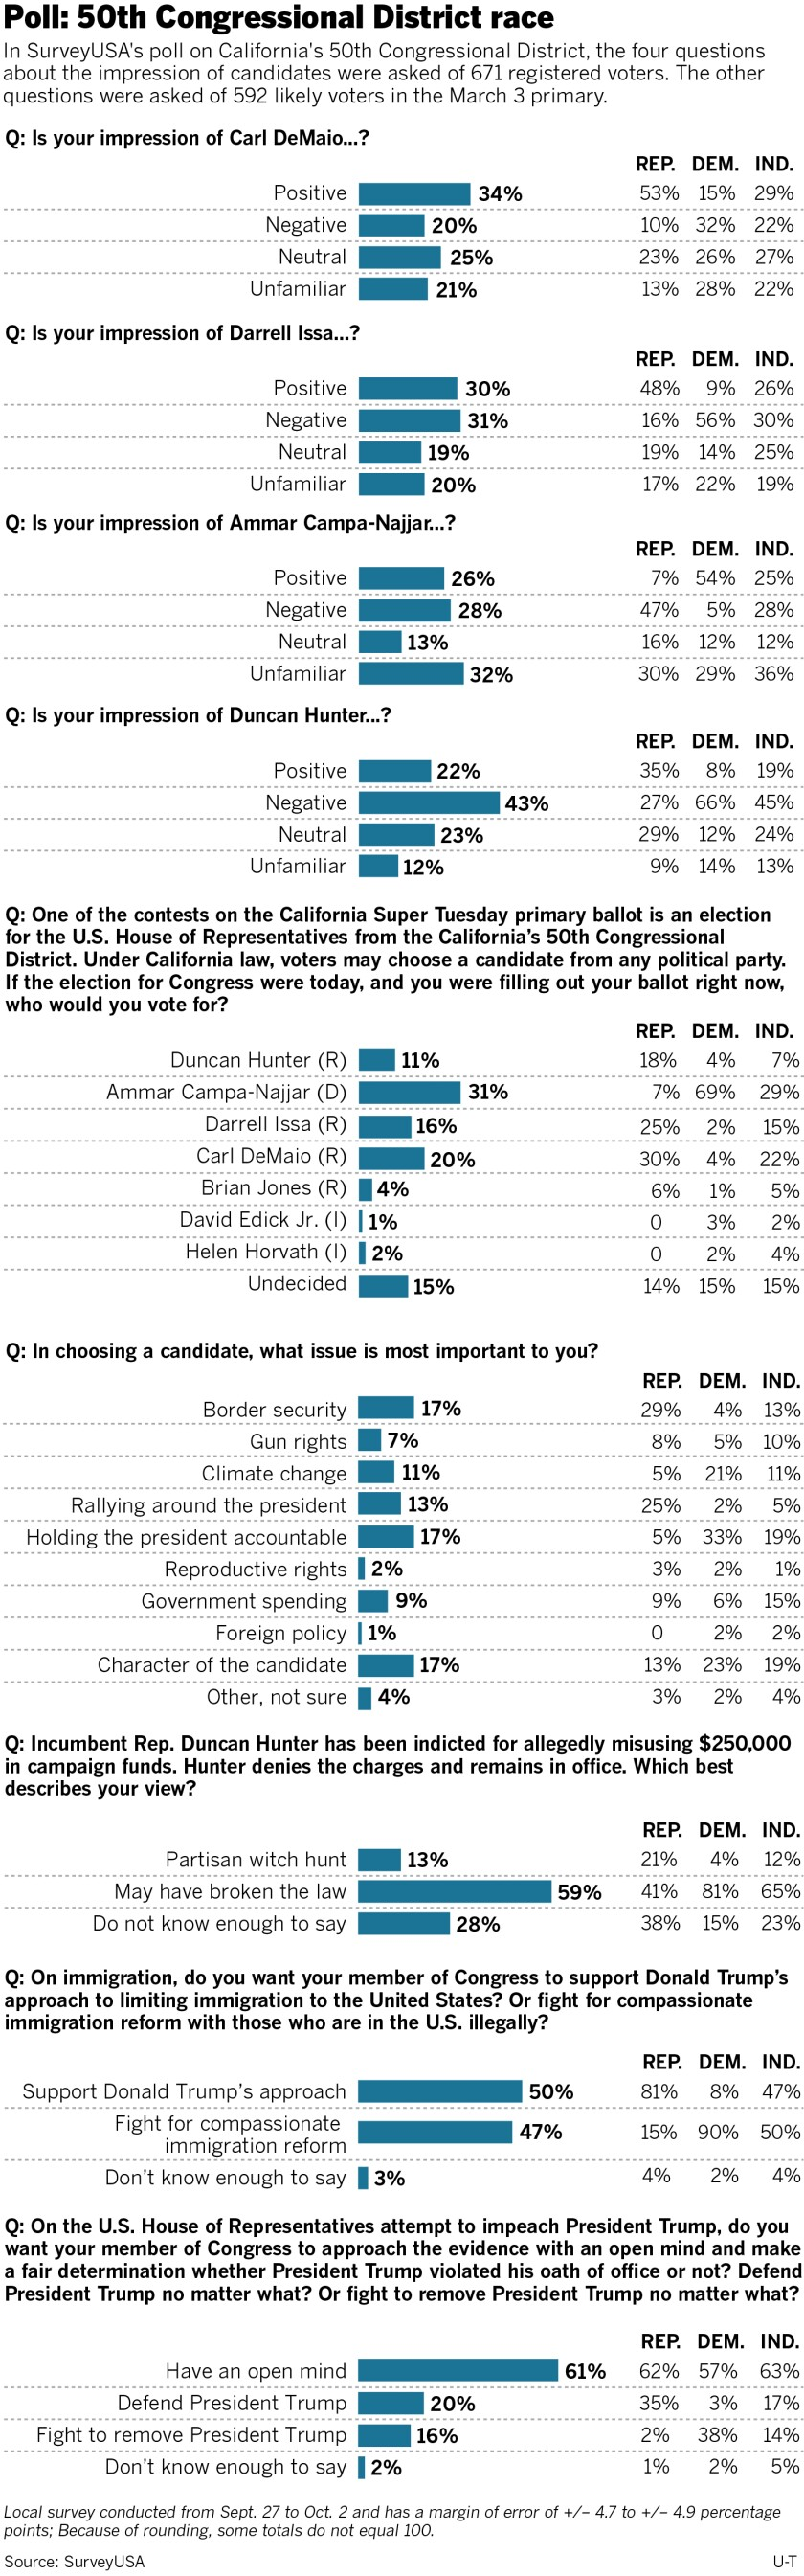 sd-me-g-50th-poll-web2-FIX-01.jpg